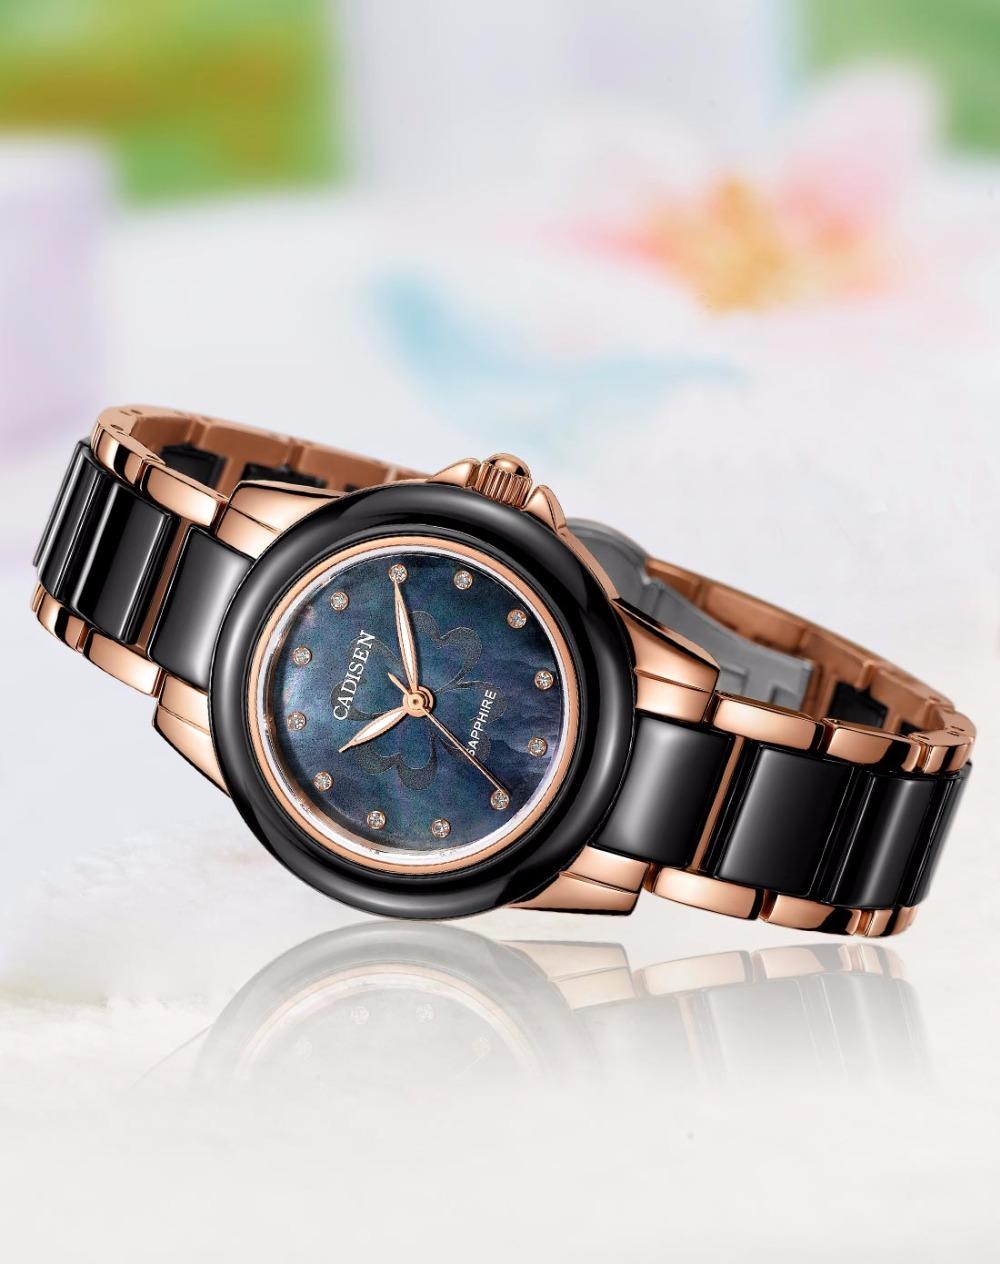 7782a66ce8b 2018 Homens Relógio de Prata Mecânico Automático Relógios Moda Marca De Luxo  Submarinista Relógio Masculino Relógio de Pulso Relojes Hombre PresenteUSD  ...